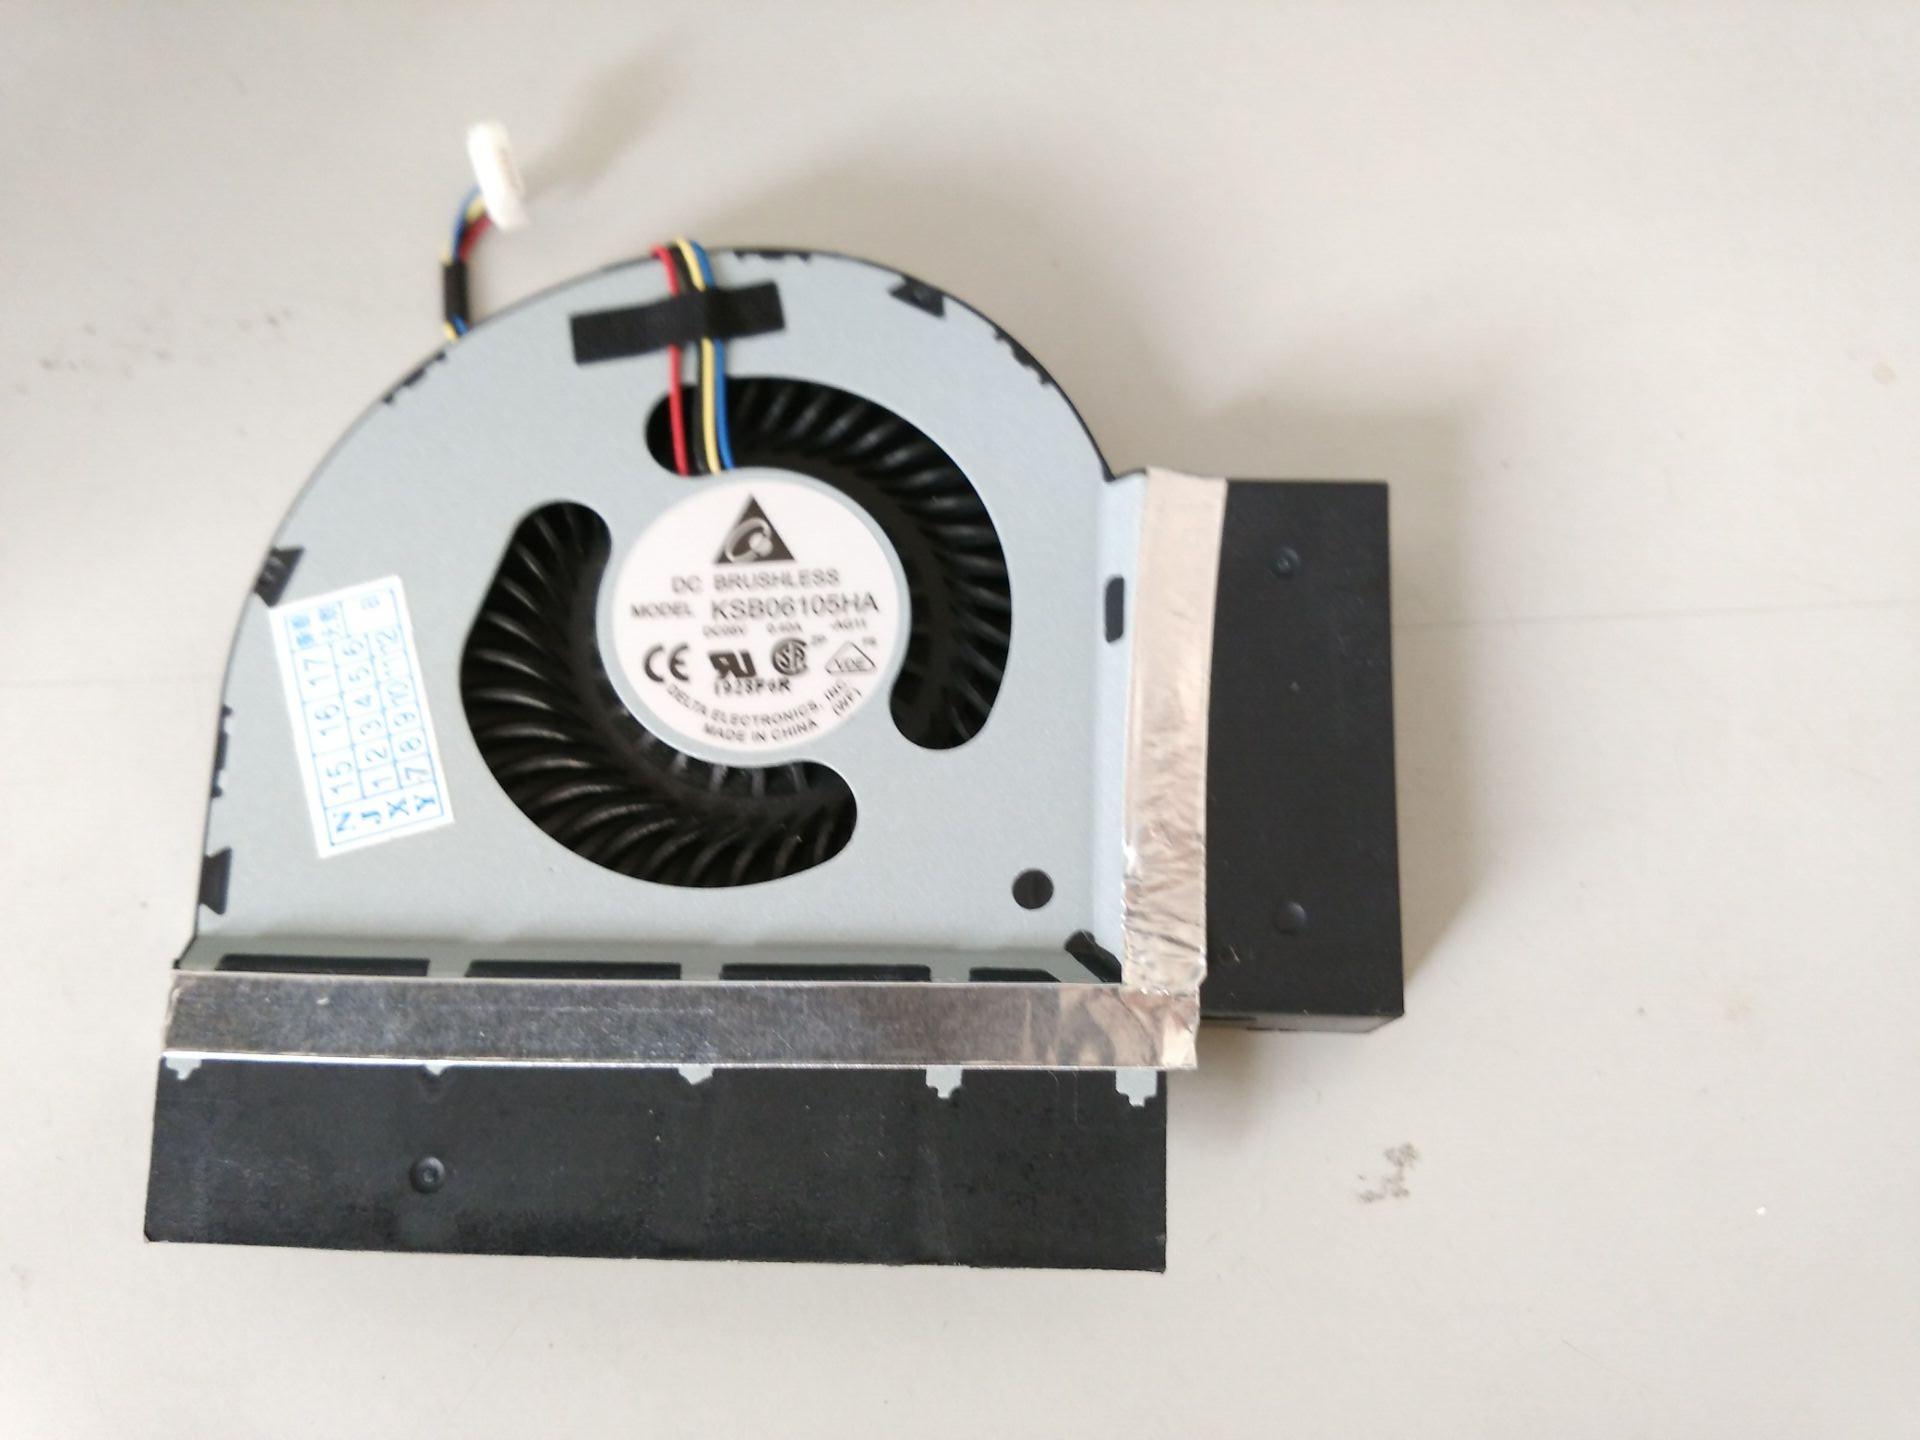 IBM Lenovo Thinkpad W520 KSB06105HA AG10 04W1579 6Pin